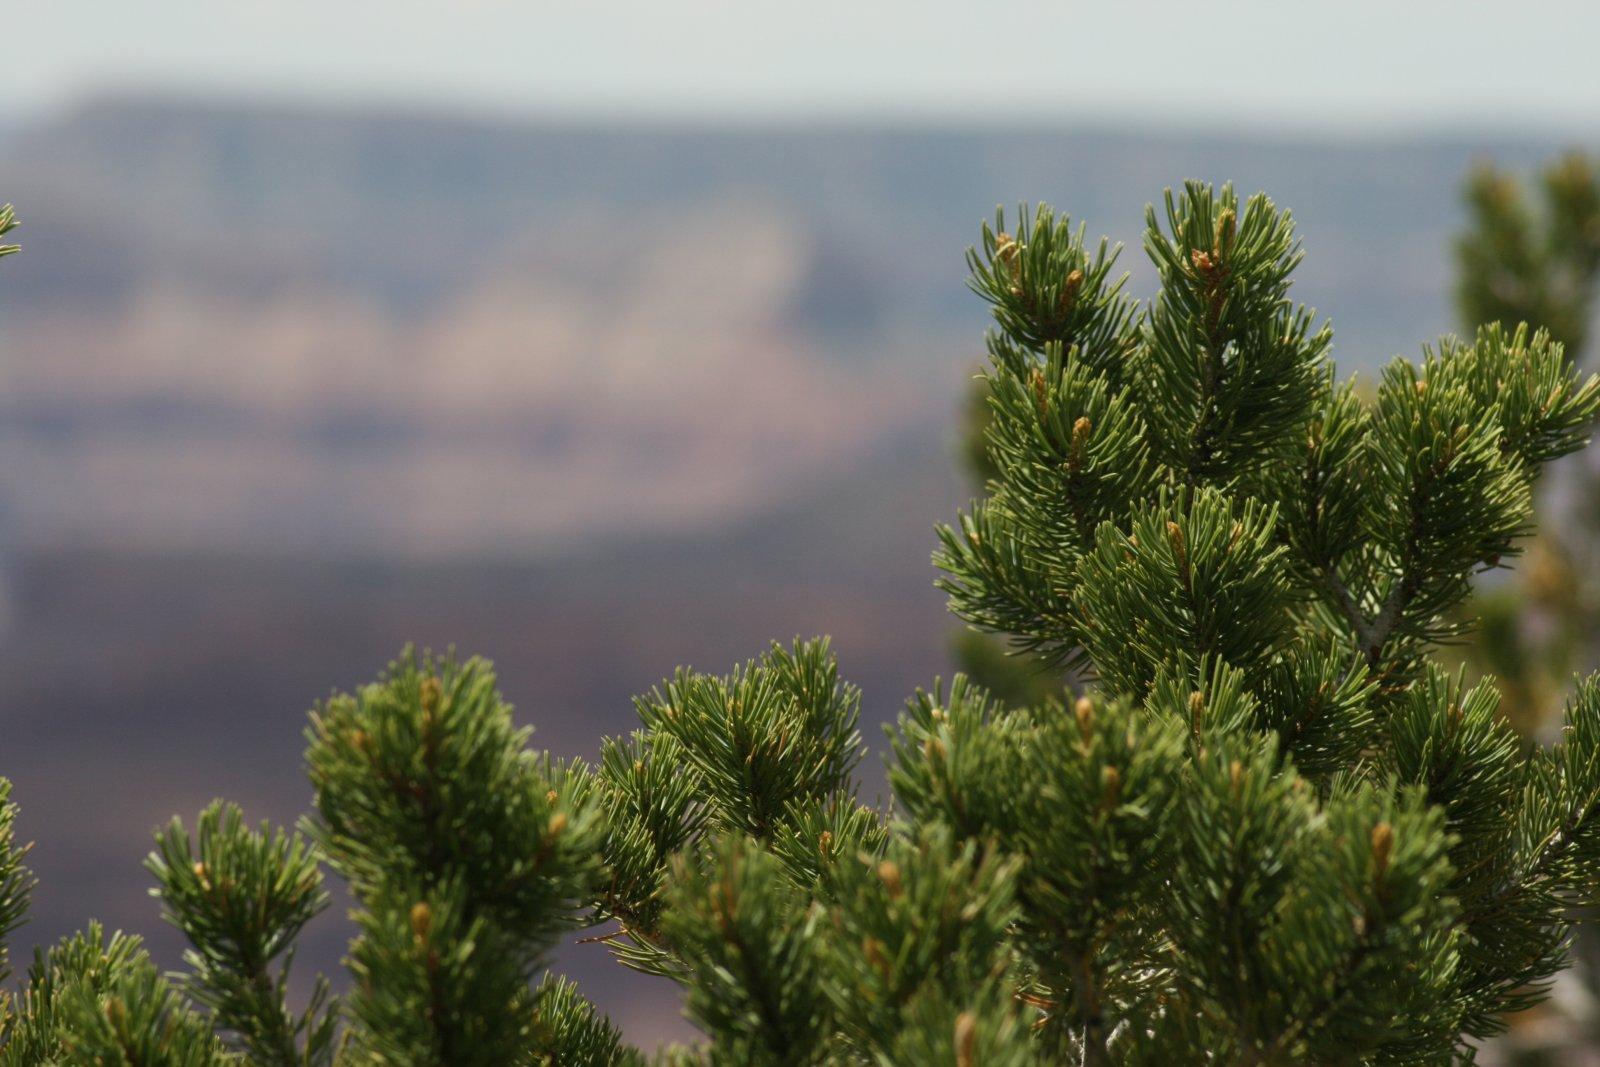 Detall d'un exemplar de Pinus edulis